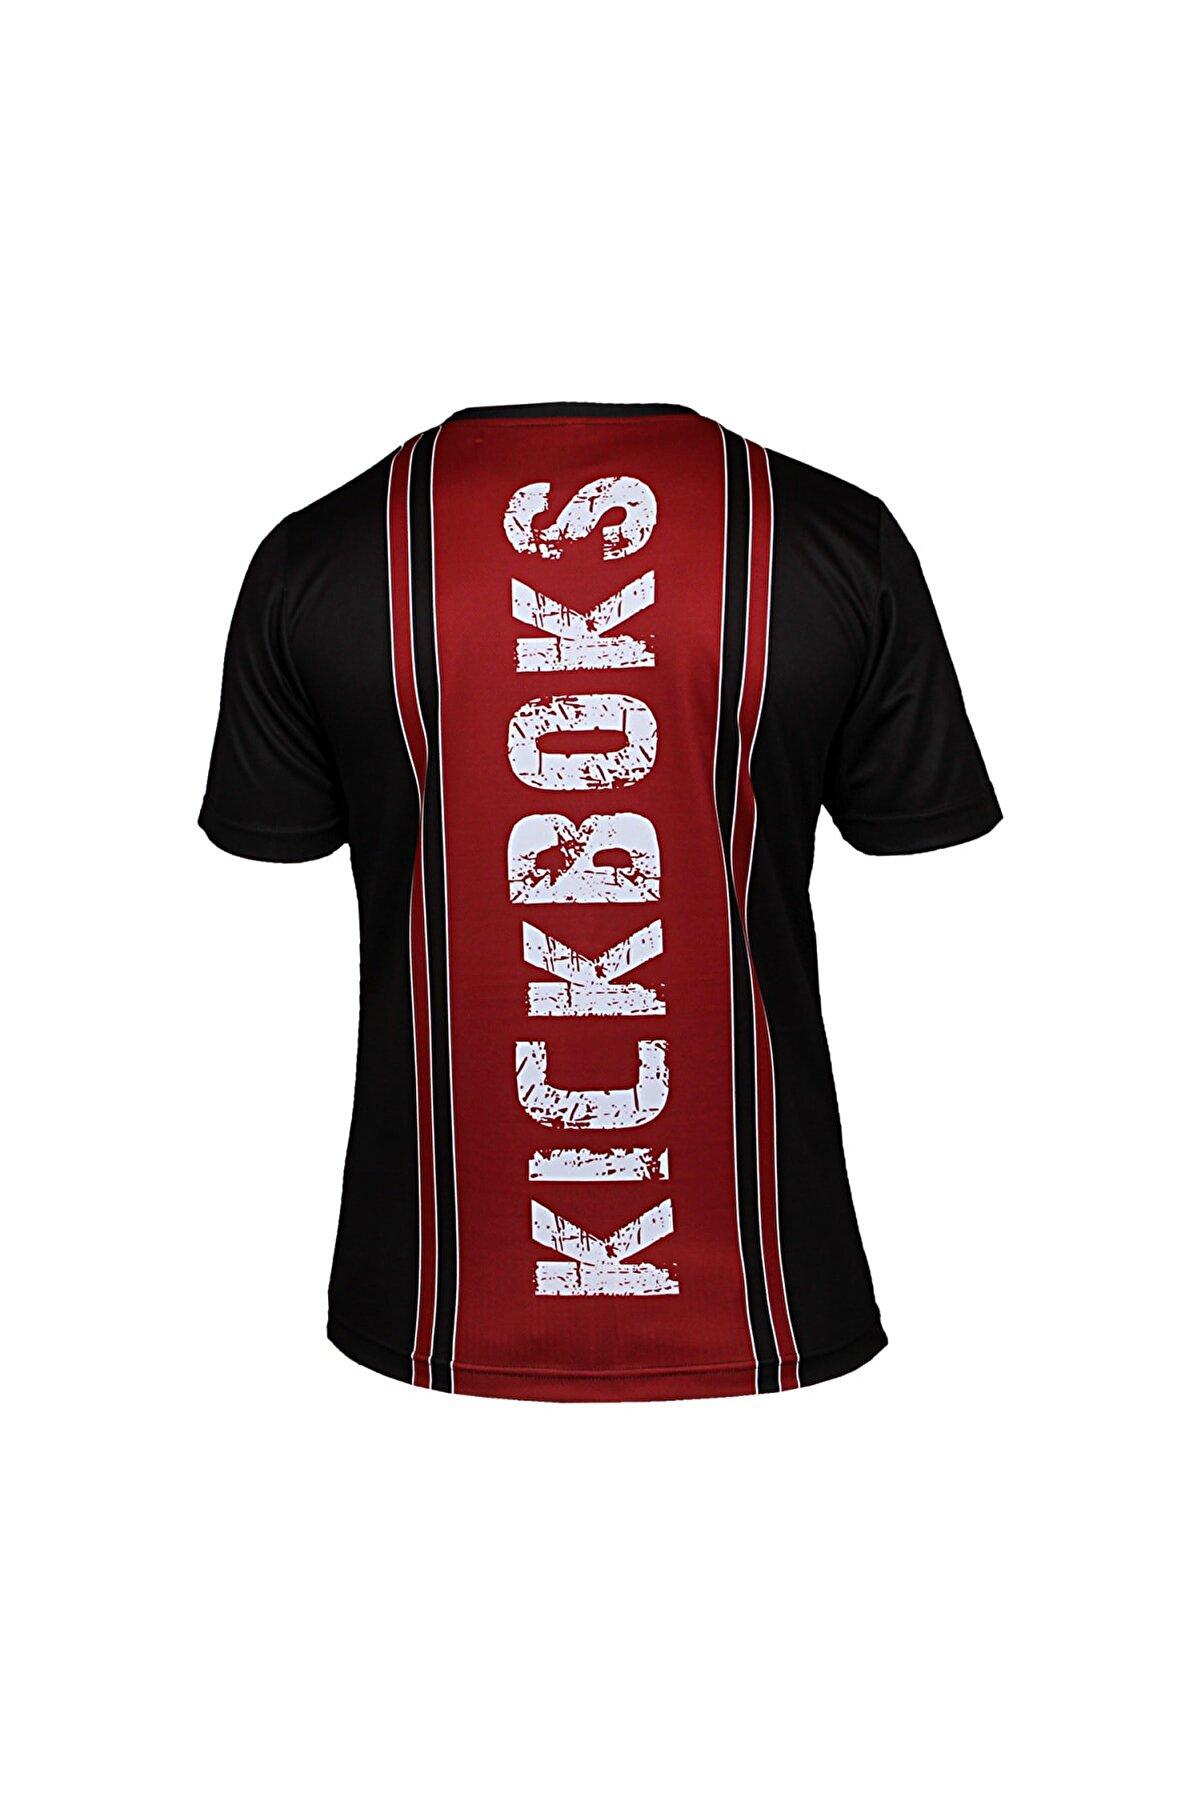 DO-SMAI Unisex Siyah Kick Boks Dijital Baskılı T-shirt Kb001